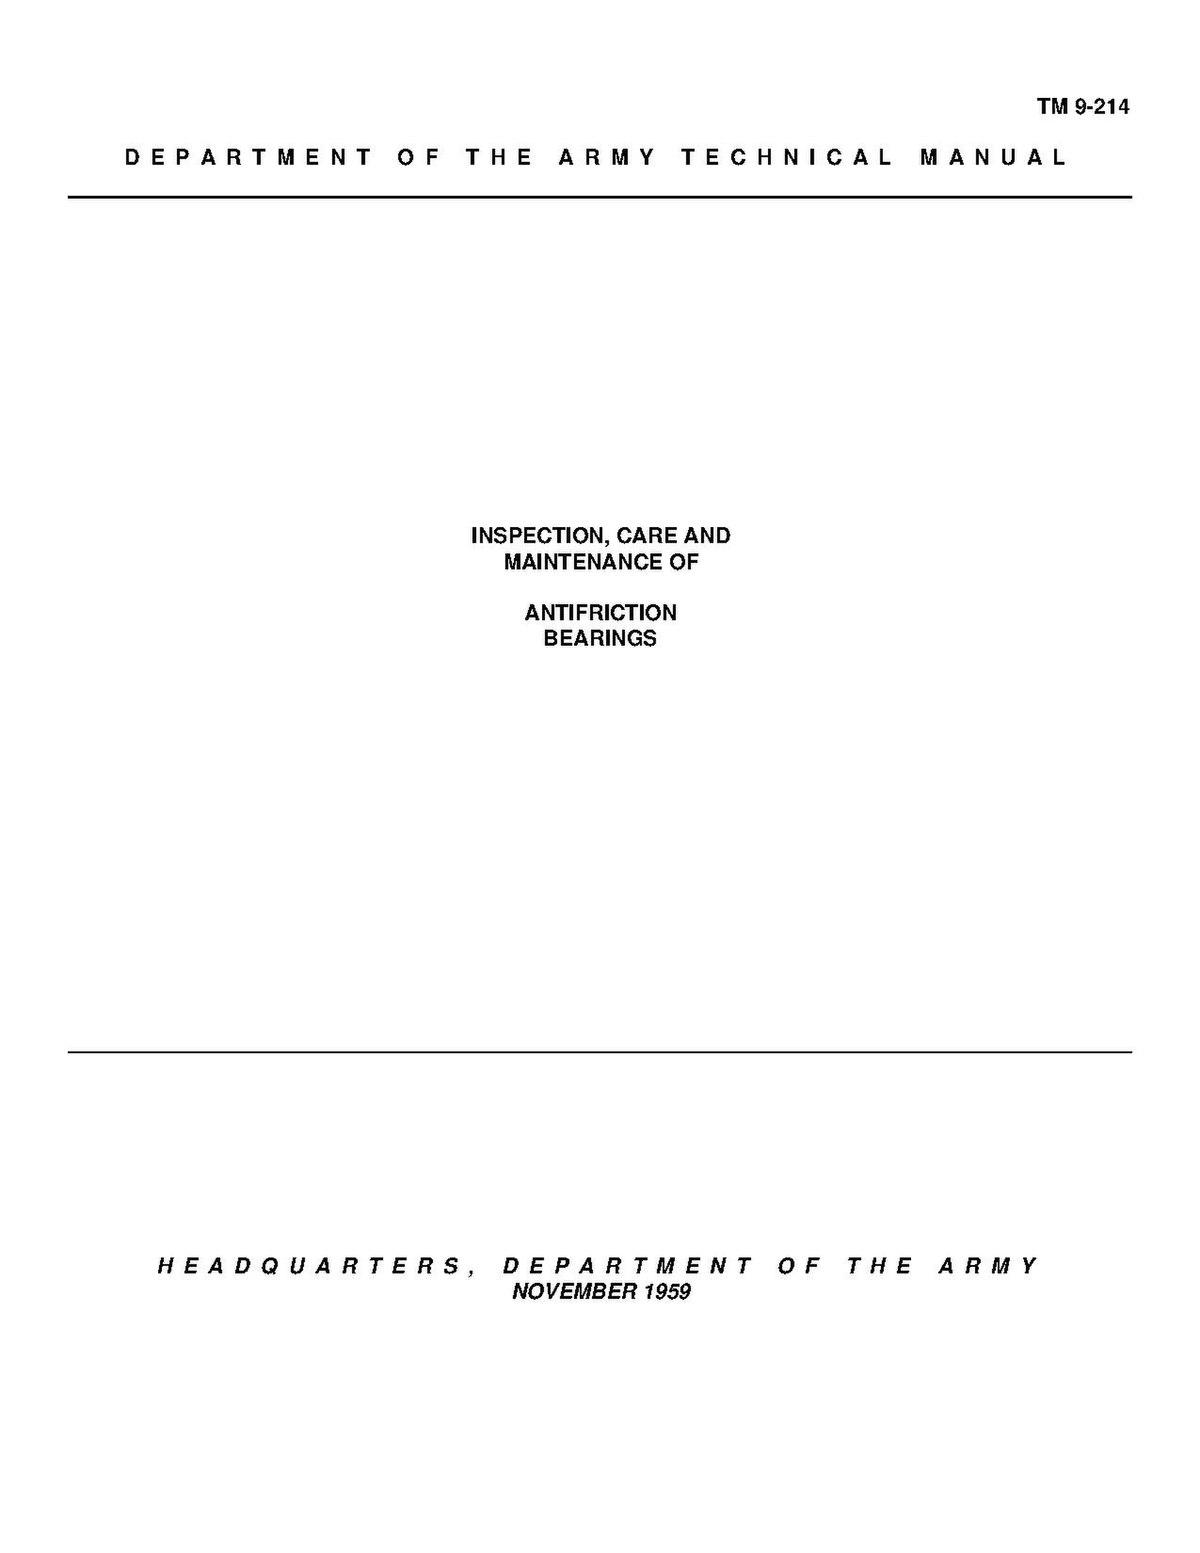 File:TM-9-214.pdf - Wikimedia Commons